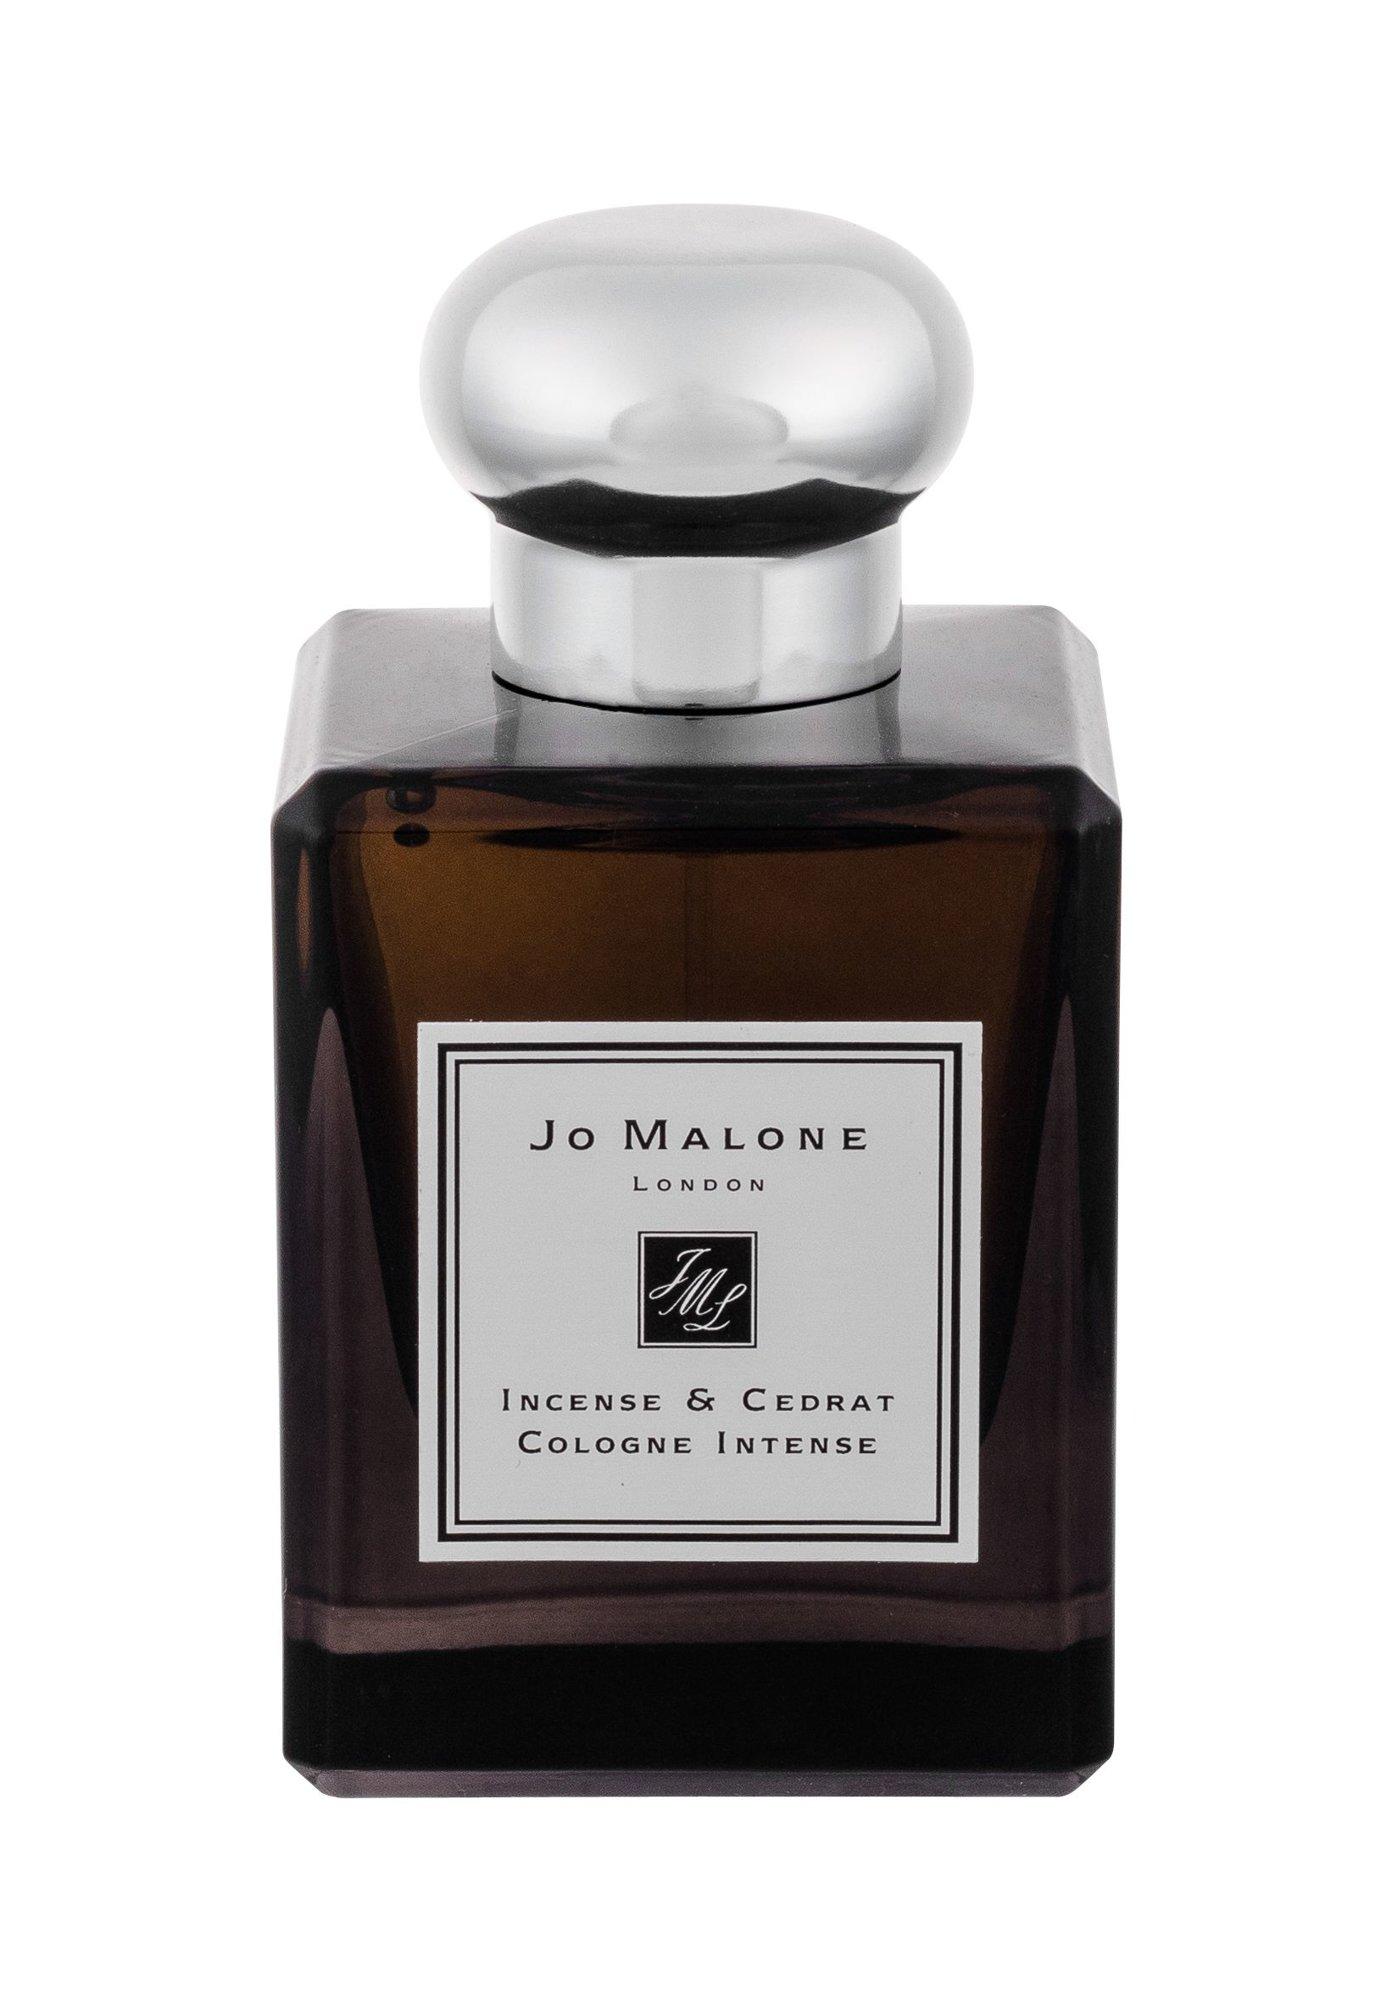 Jo Malone Incense & Cedrat Eau de Cologne 50ml